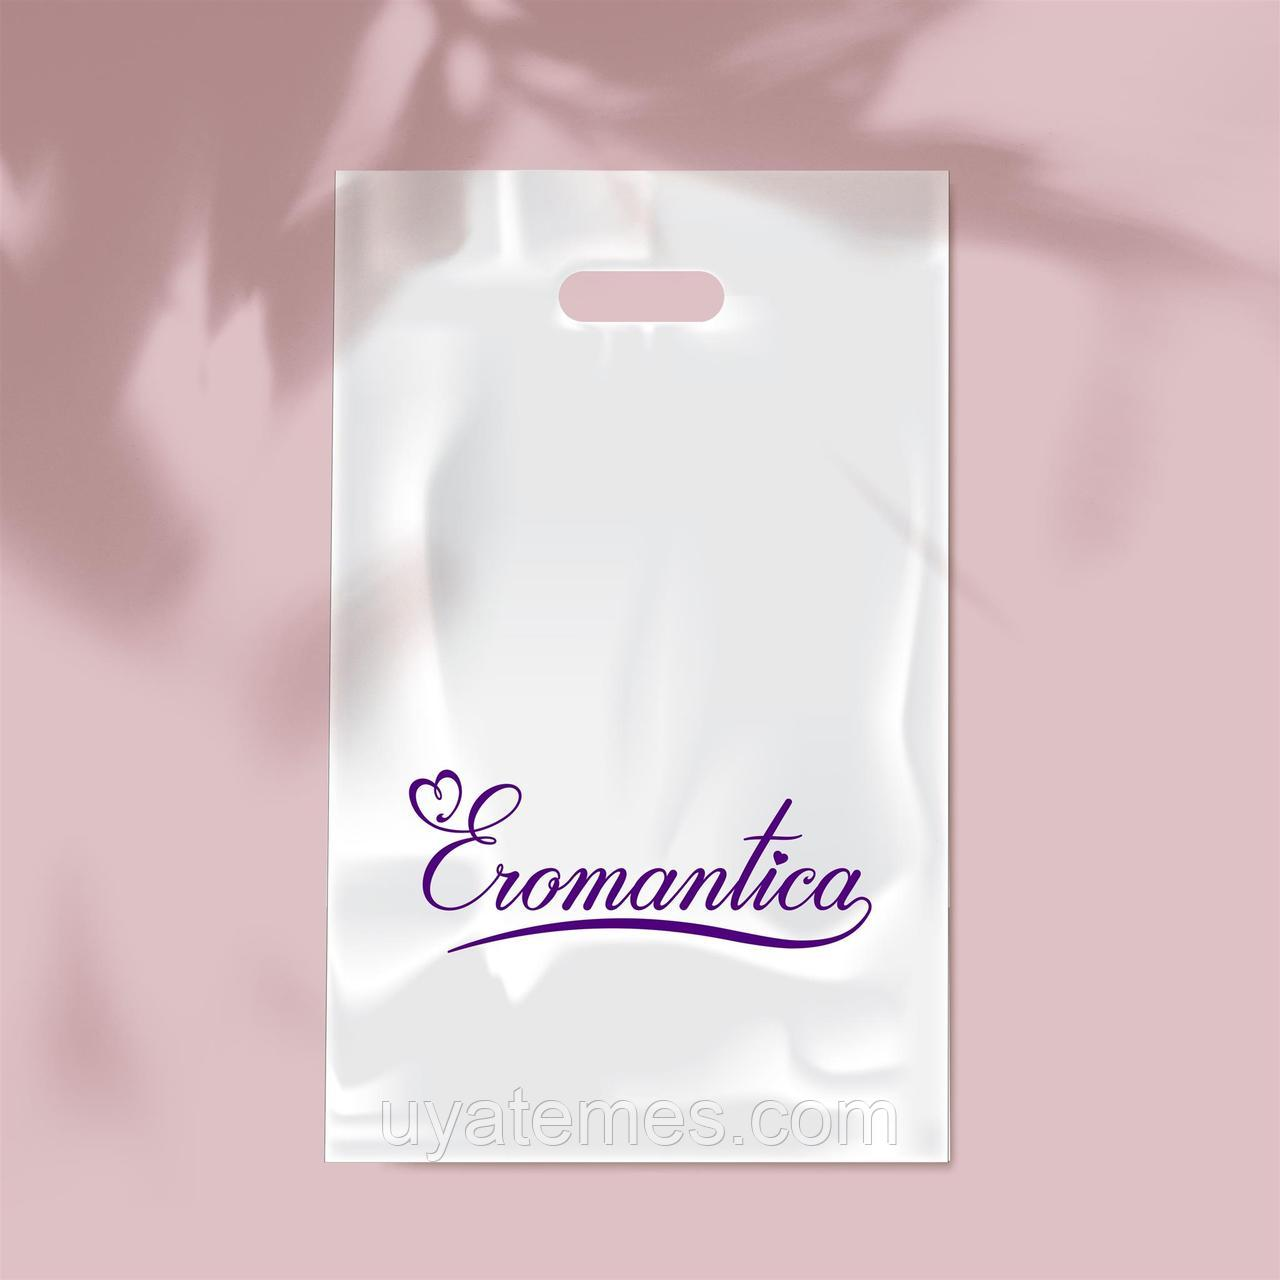 Пакет Eromantica белый, 15*27, упаковка 100 шт